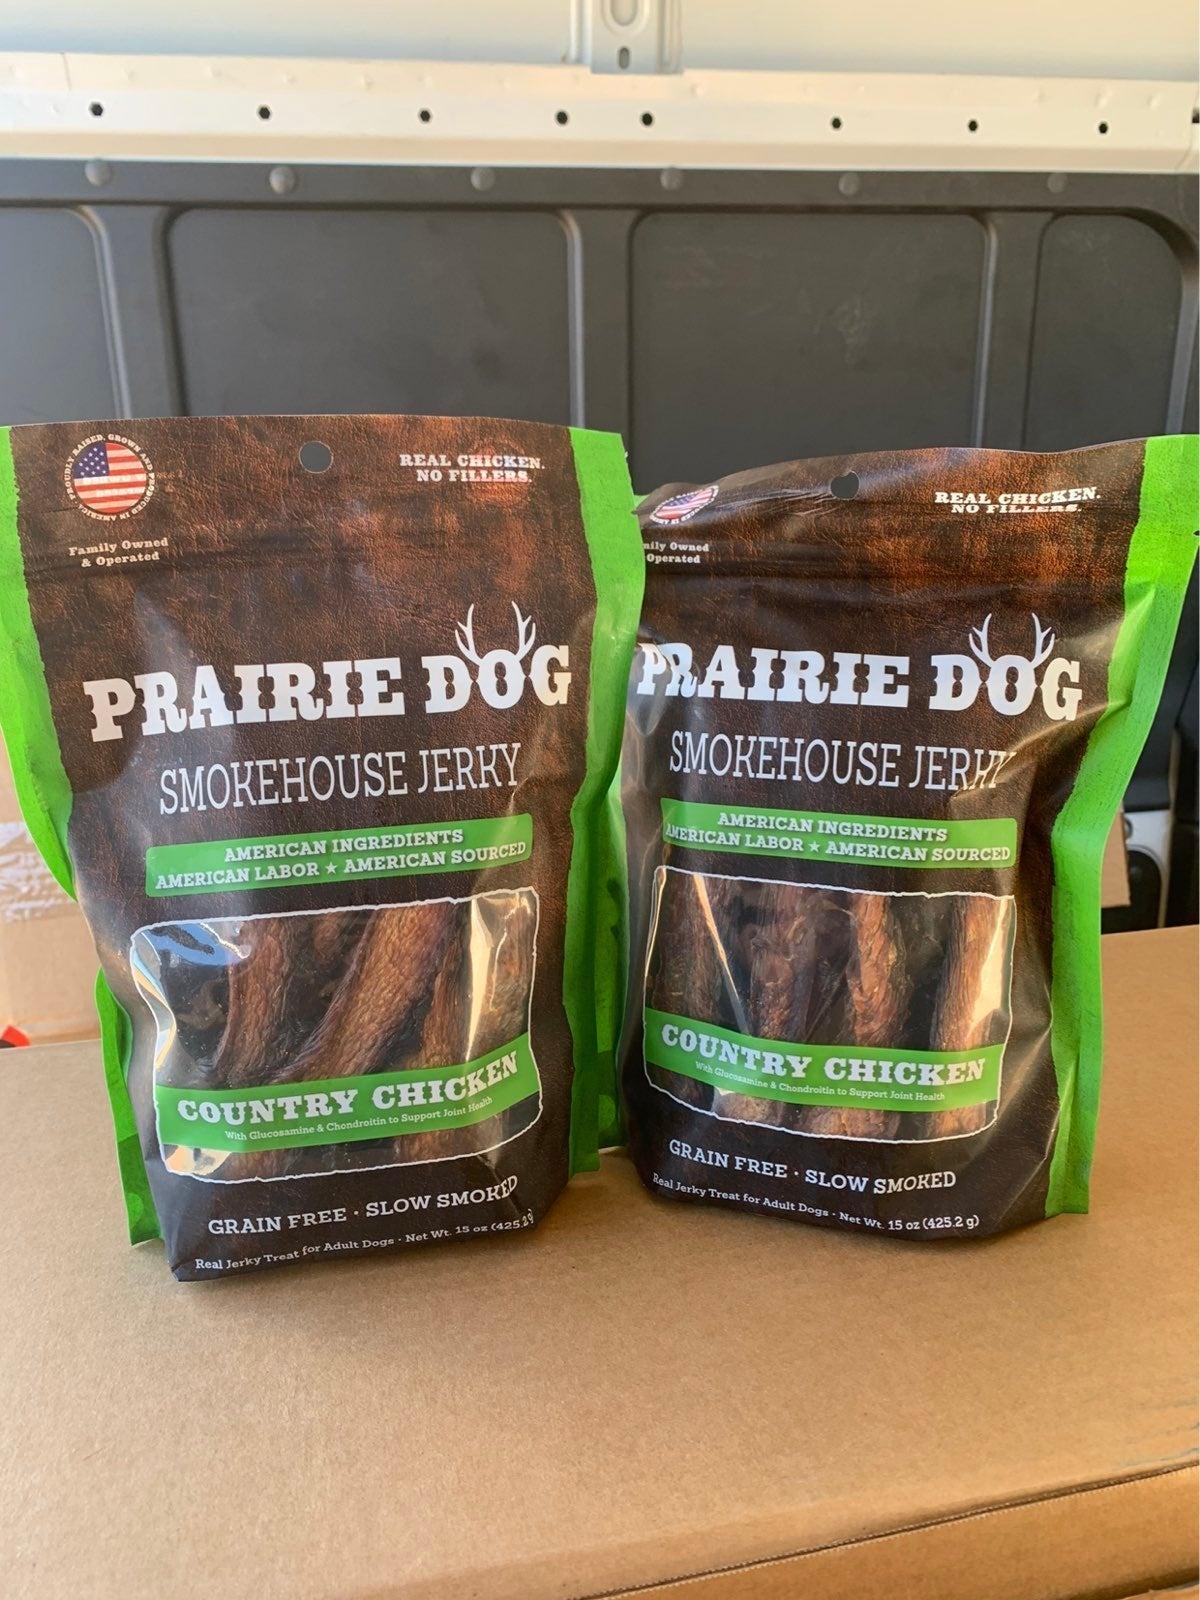 Prairie dog Smokehouse jerky Treats